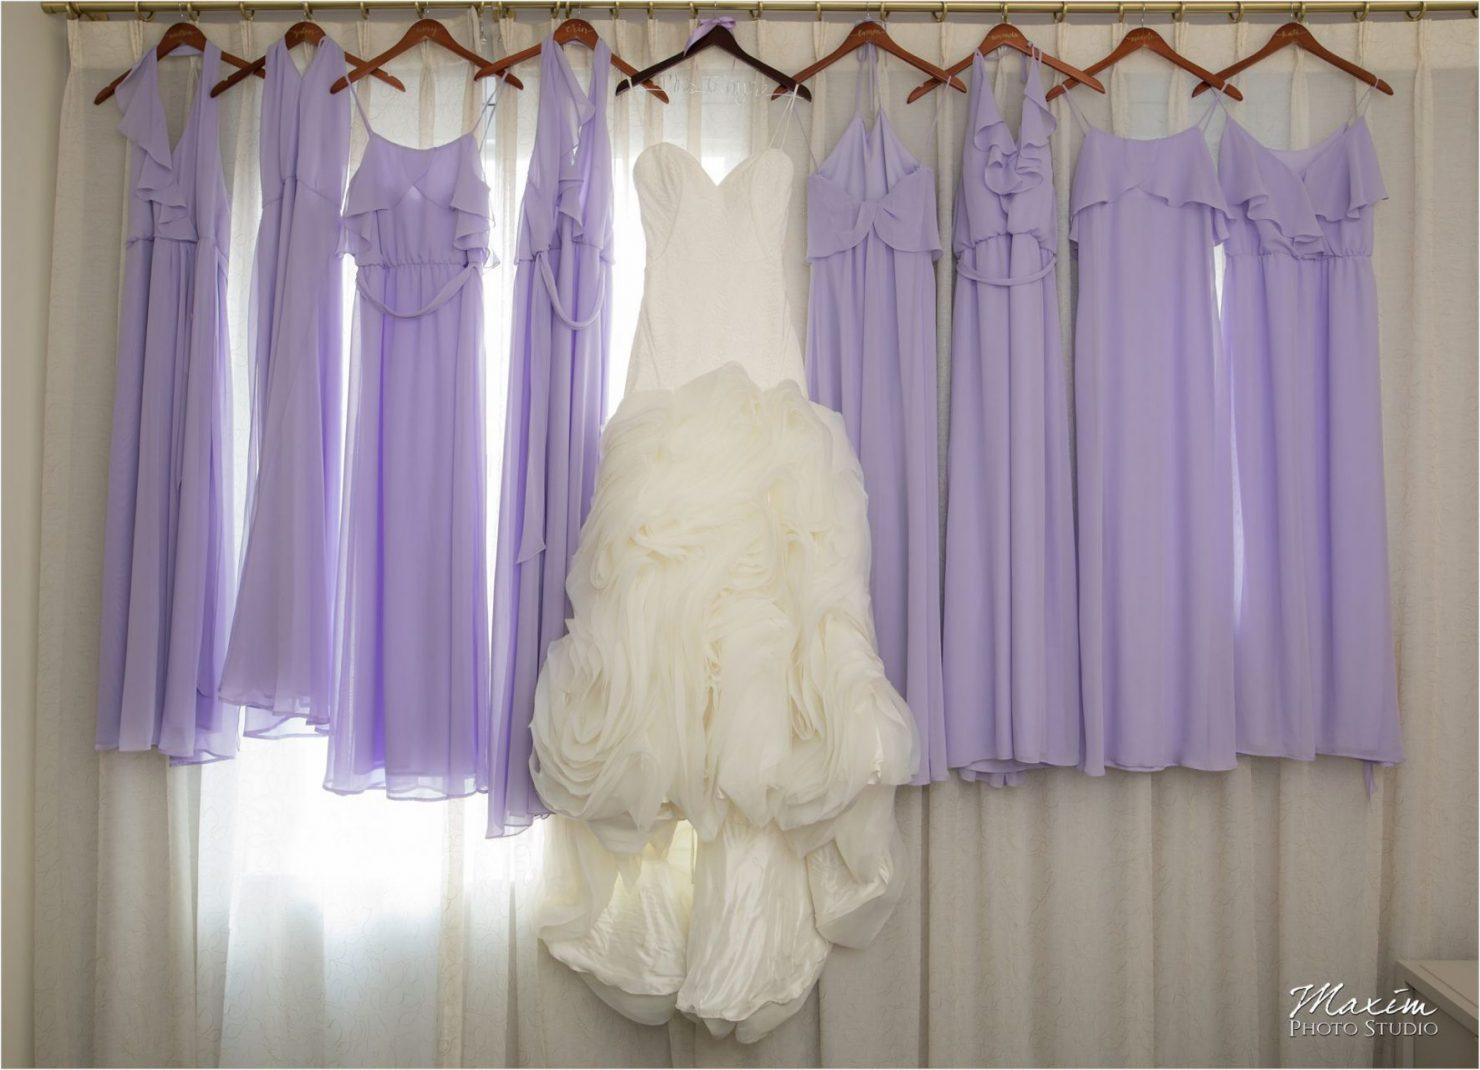 Drees Pavilion 21C Museum Hotel Wedding Preparations